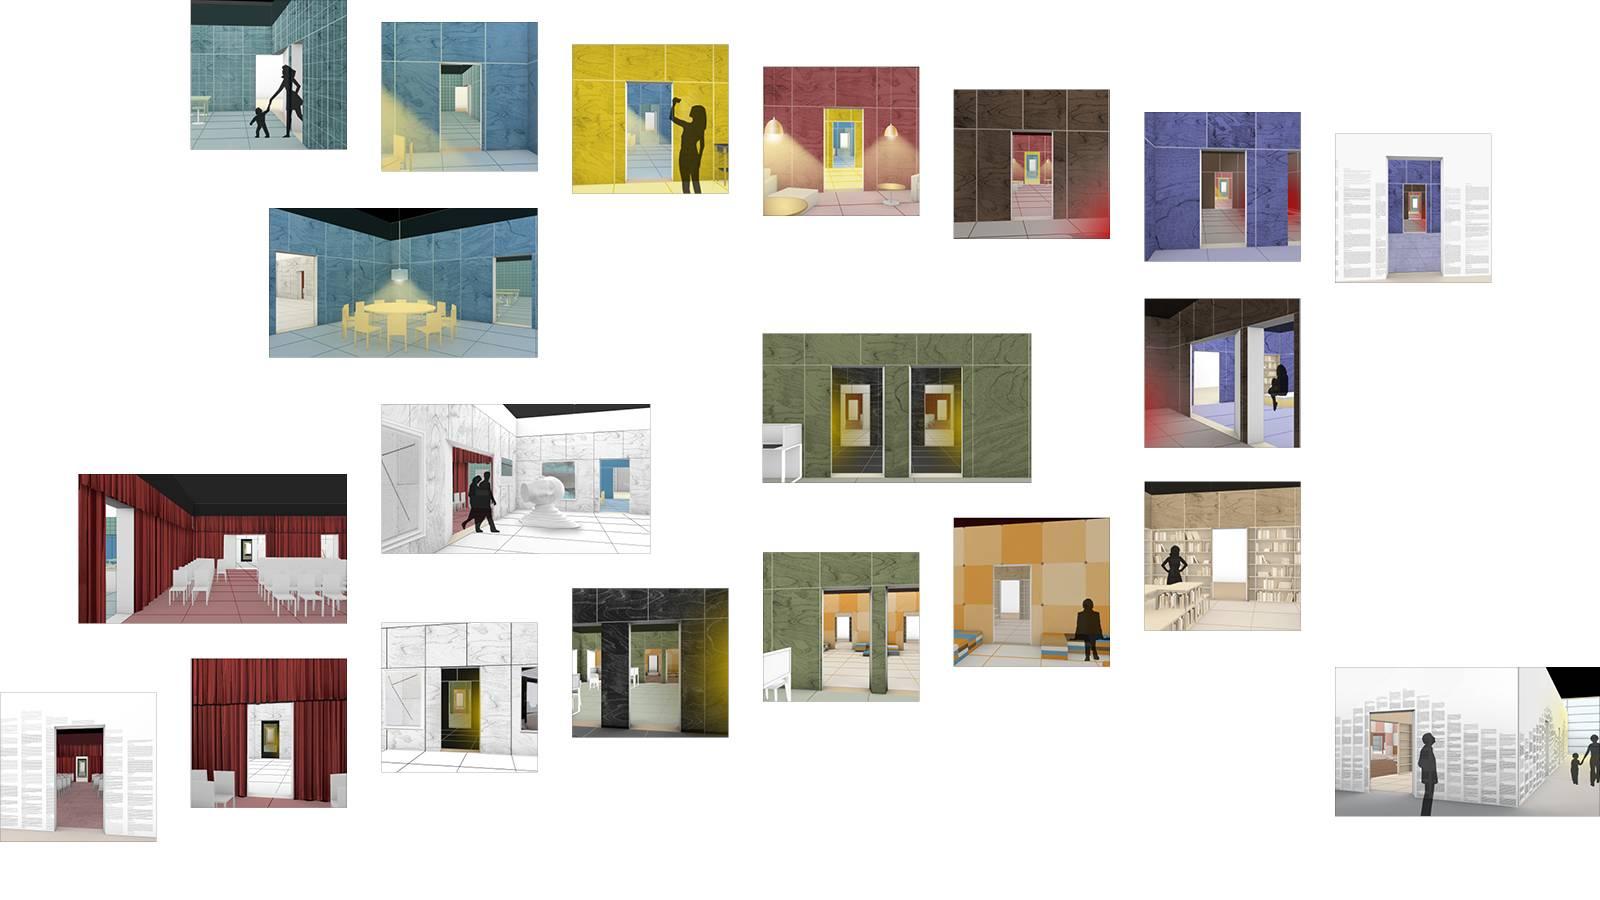 PERSPECTIVE SEQUENCES - Frankfurt Book Fair Pavilion - SPOL Architects